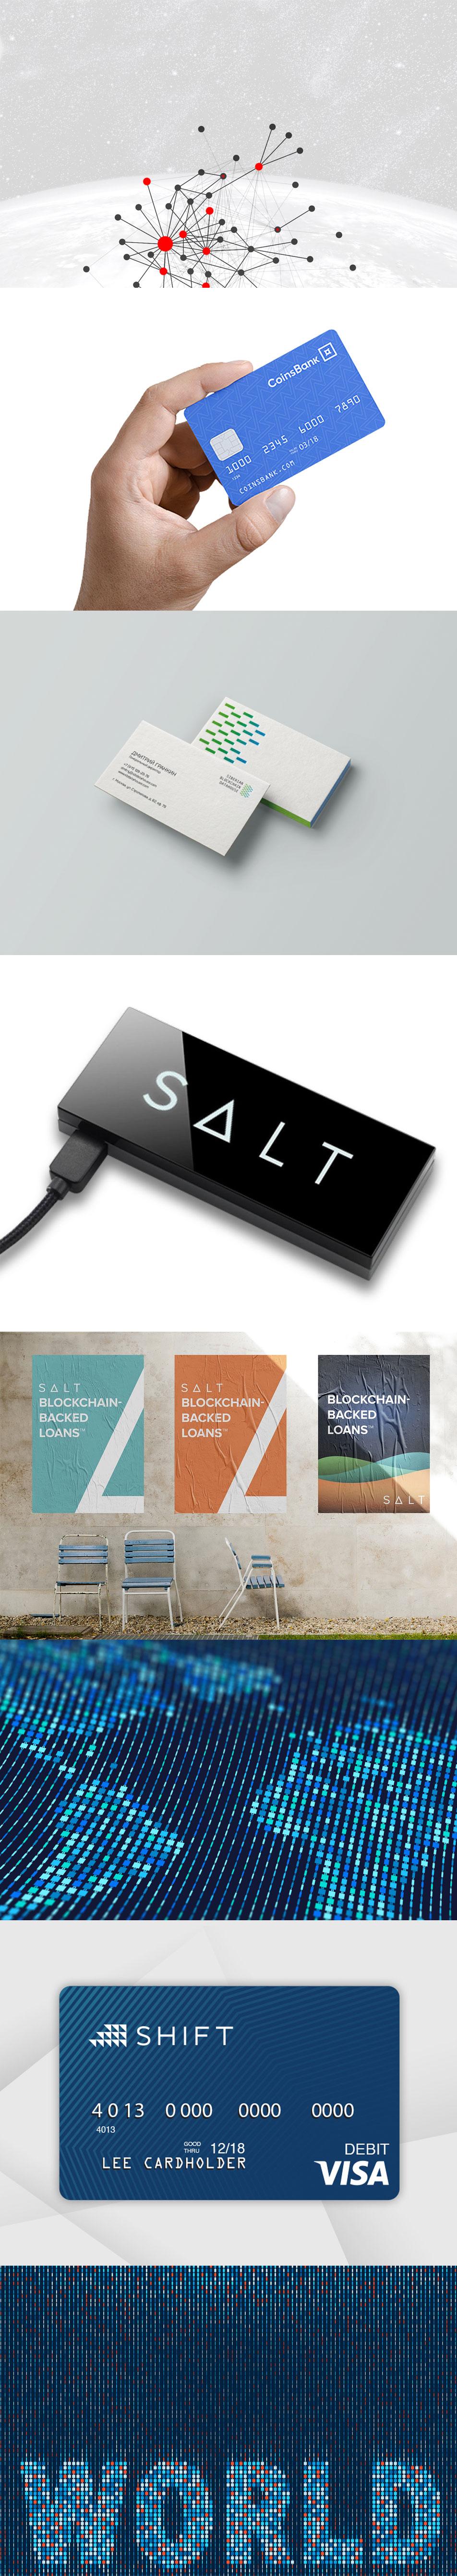 Credits: 1. Julien Gionis; 2. CoinsBank; 3. Ivan Shaykhislamov; 4,5. Salt Lending; 6. Mario De Meyer; 7. Shift Payments; 8. Mario De Meyer